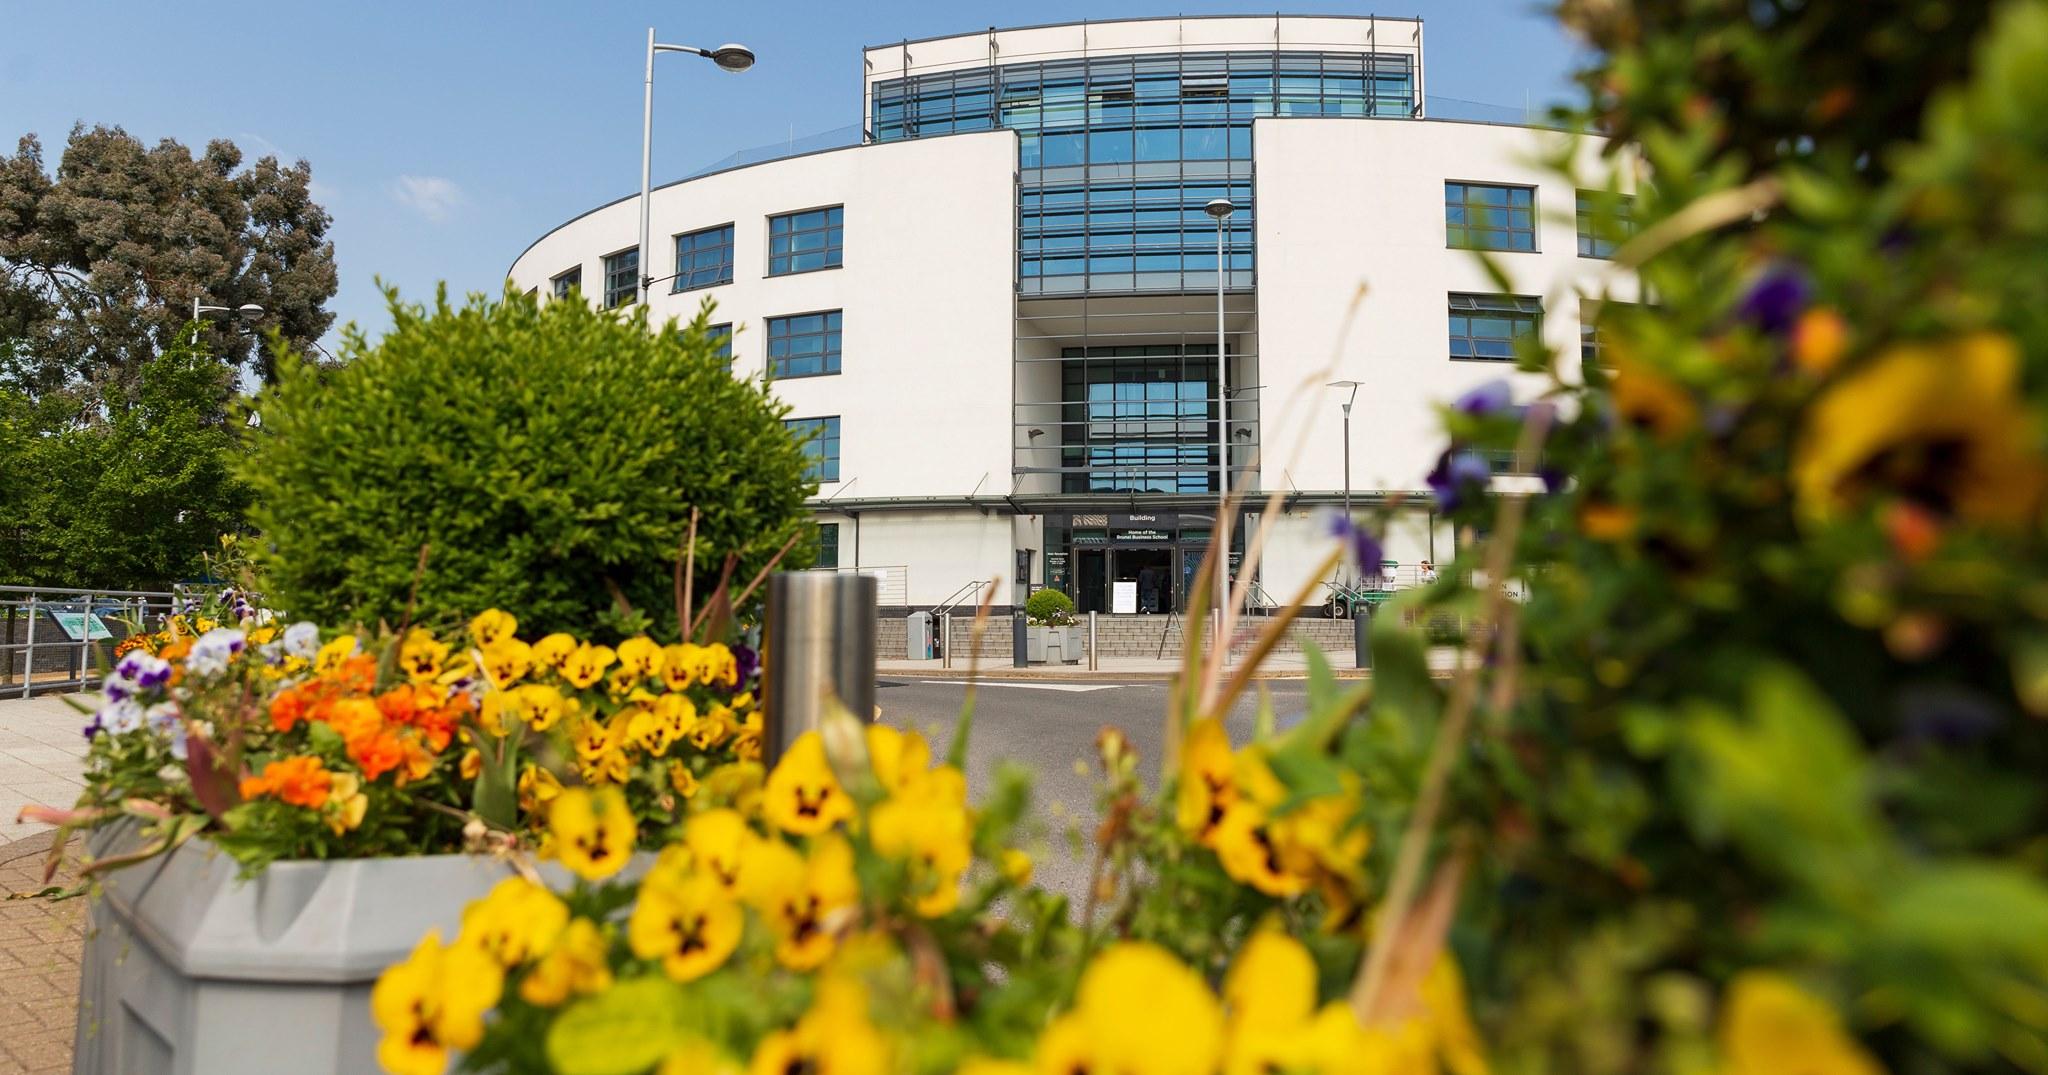 Brunel University London – Scholarships and Bursaries for International Students